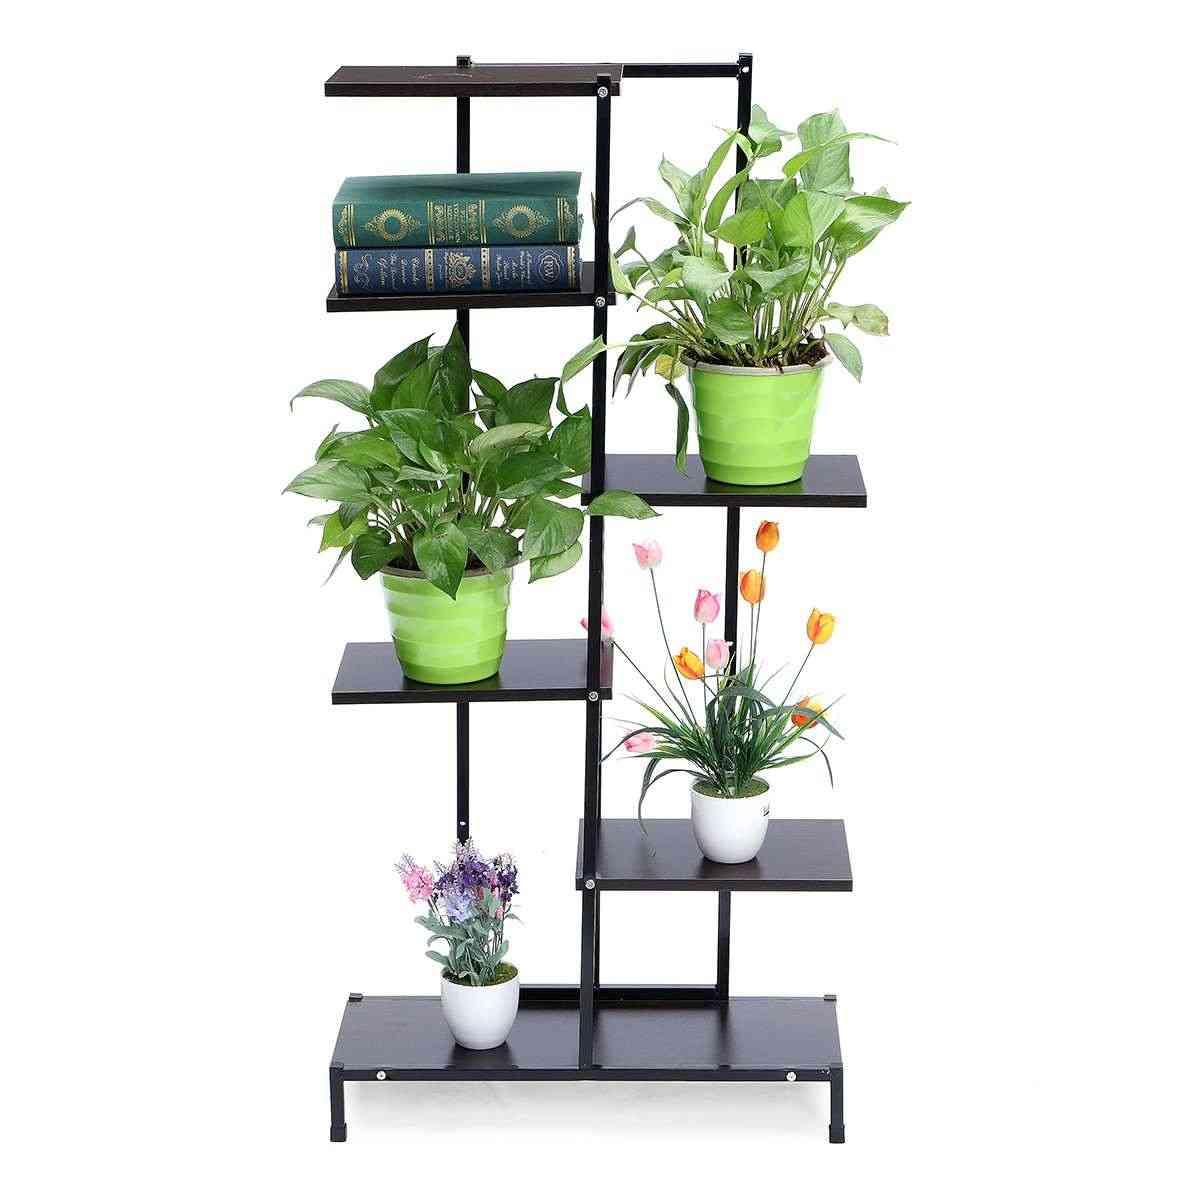 5 Tiers Wooden/iron Bookshelf & Plant Rack Display Shelf Home Yard/garden Patio Balcony Flower Stands